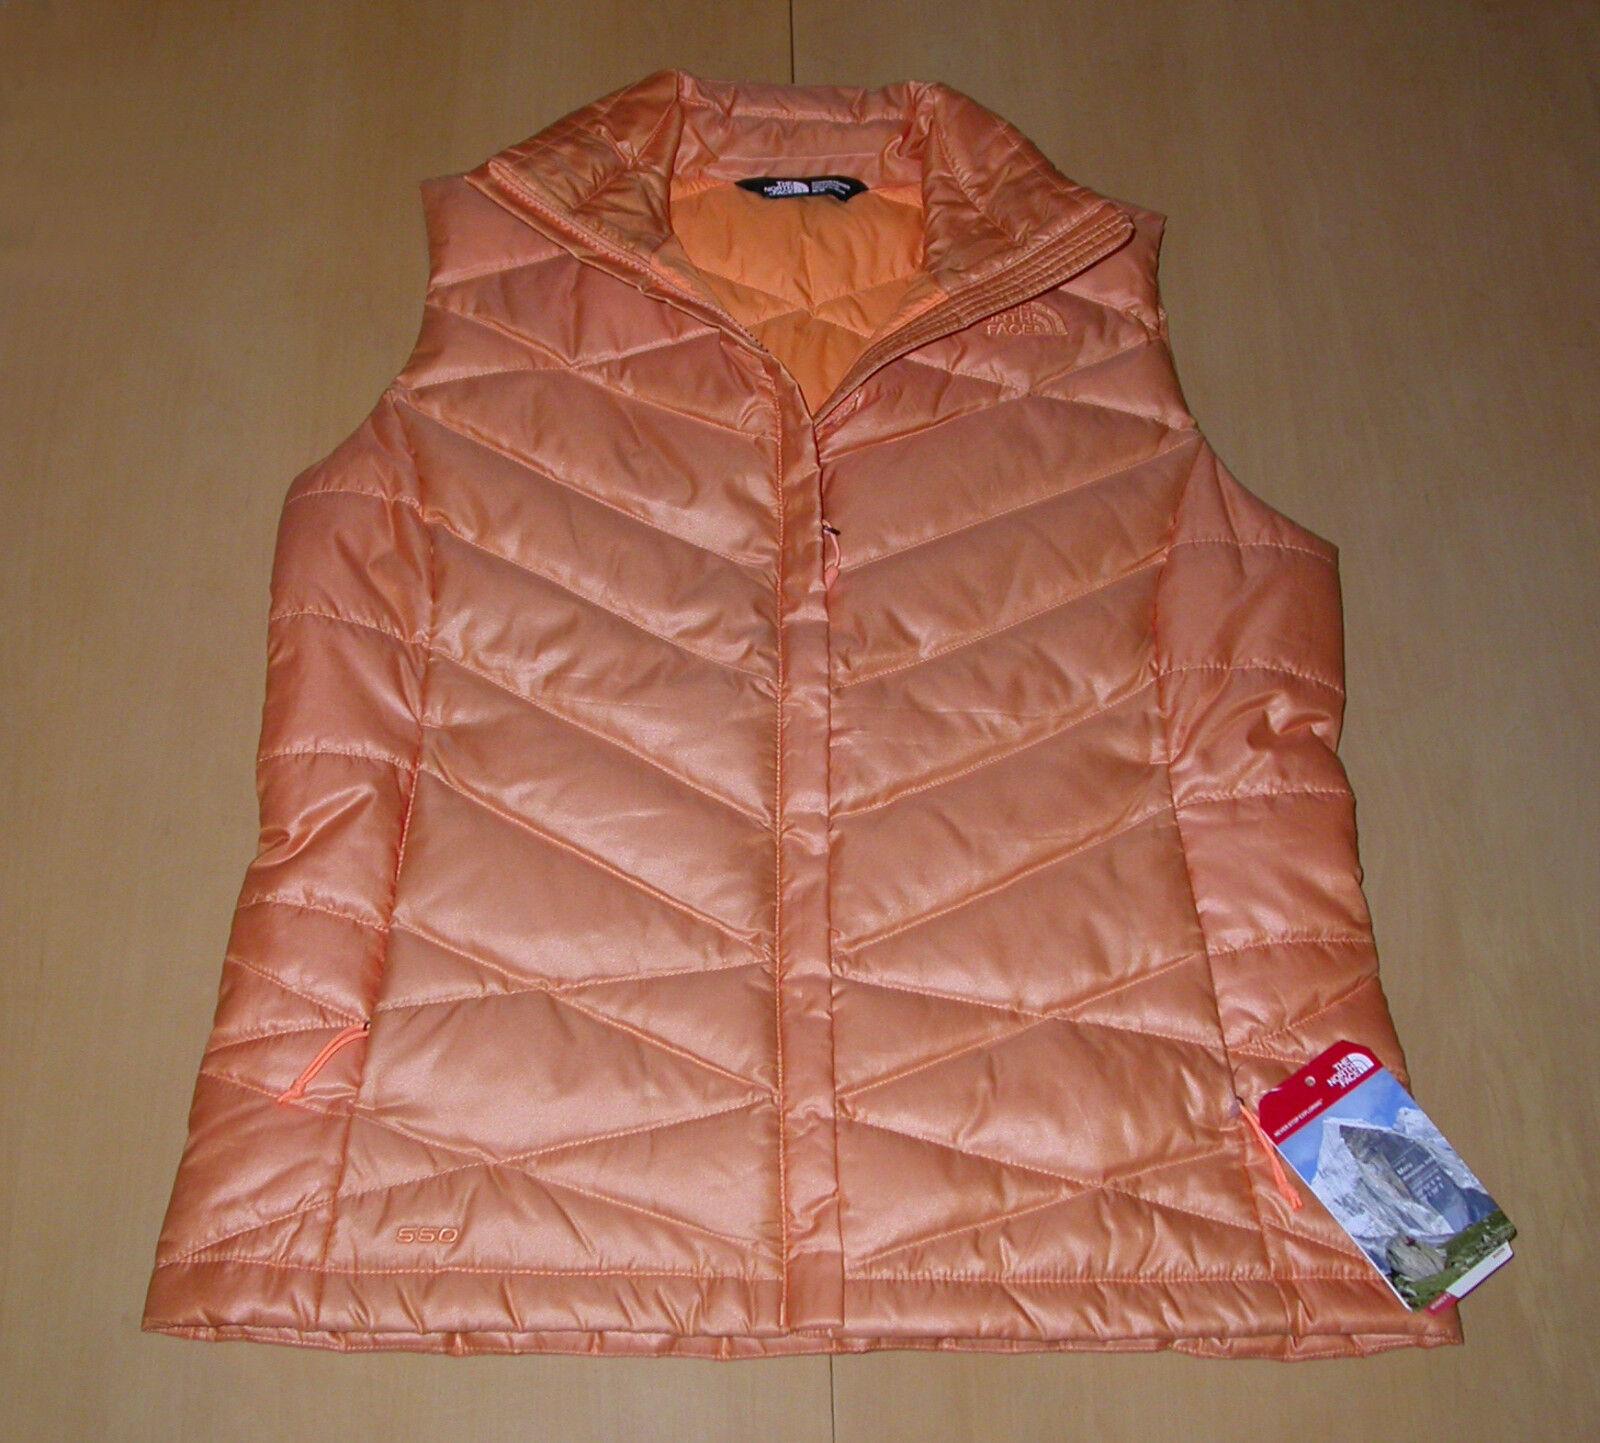 NWT The North Face Aconcagua Down Vest Impact orange Womens Sz M